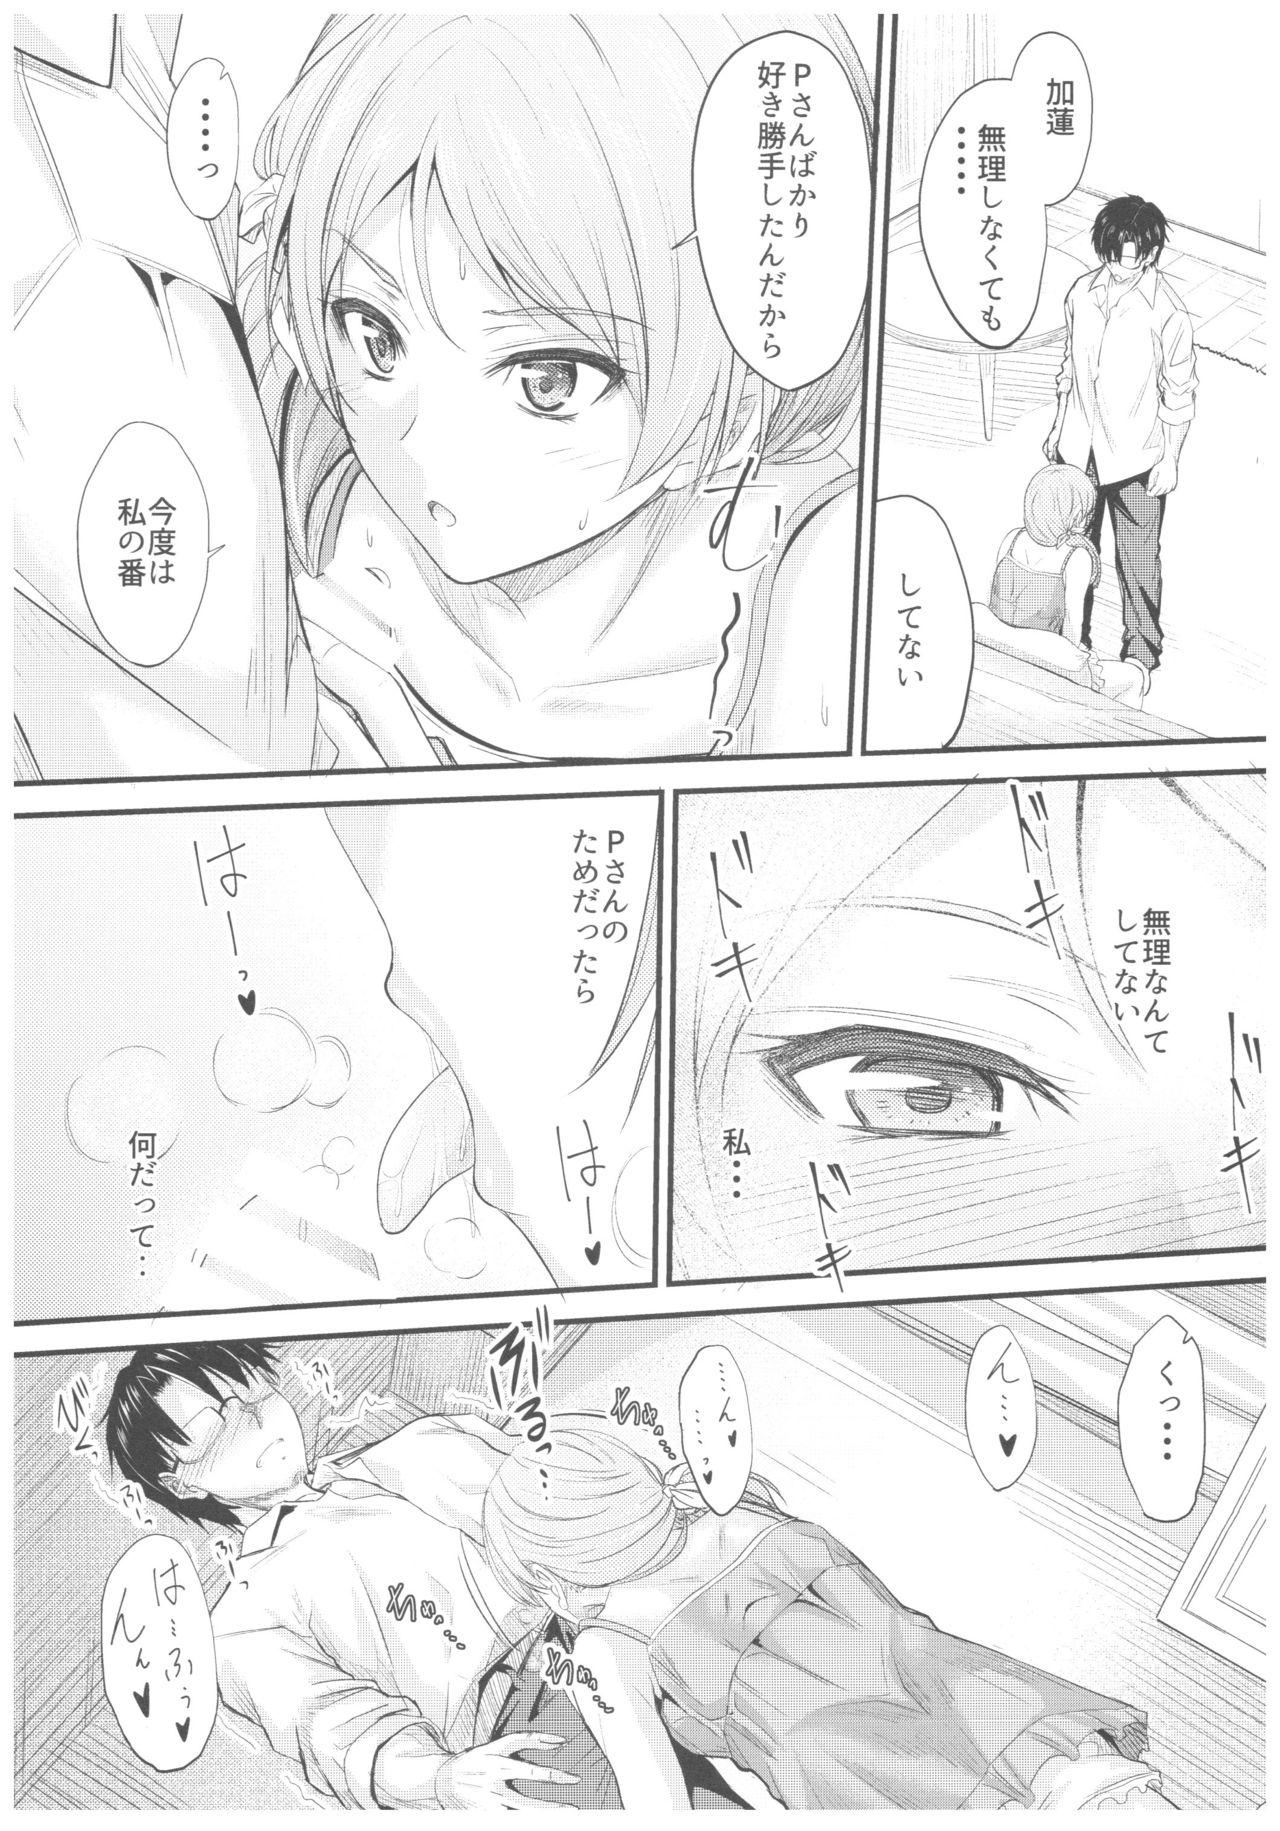 Natsuiro Karen 11